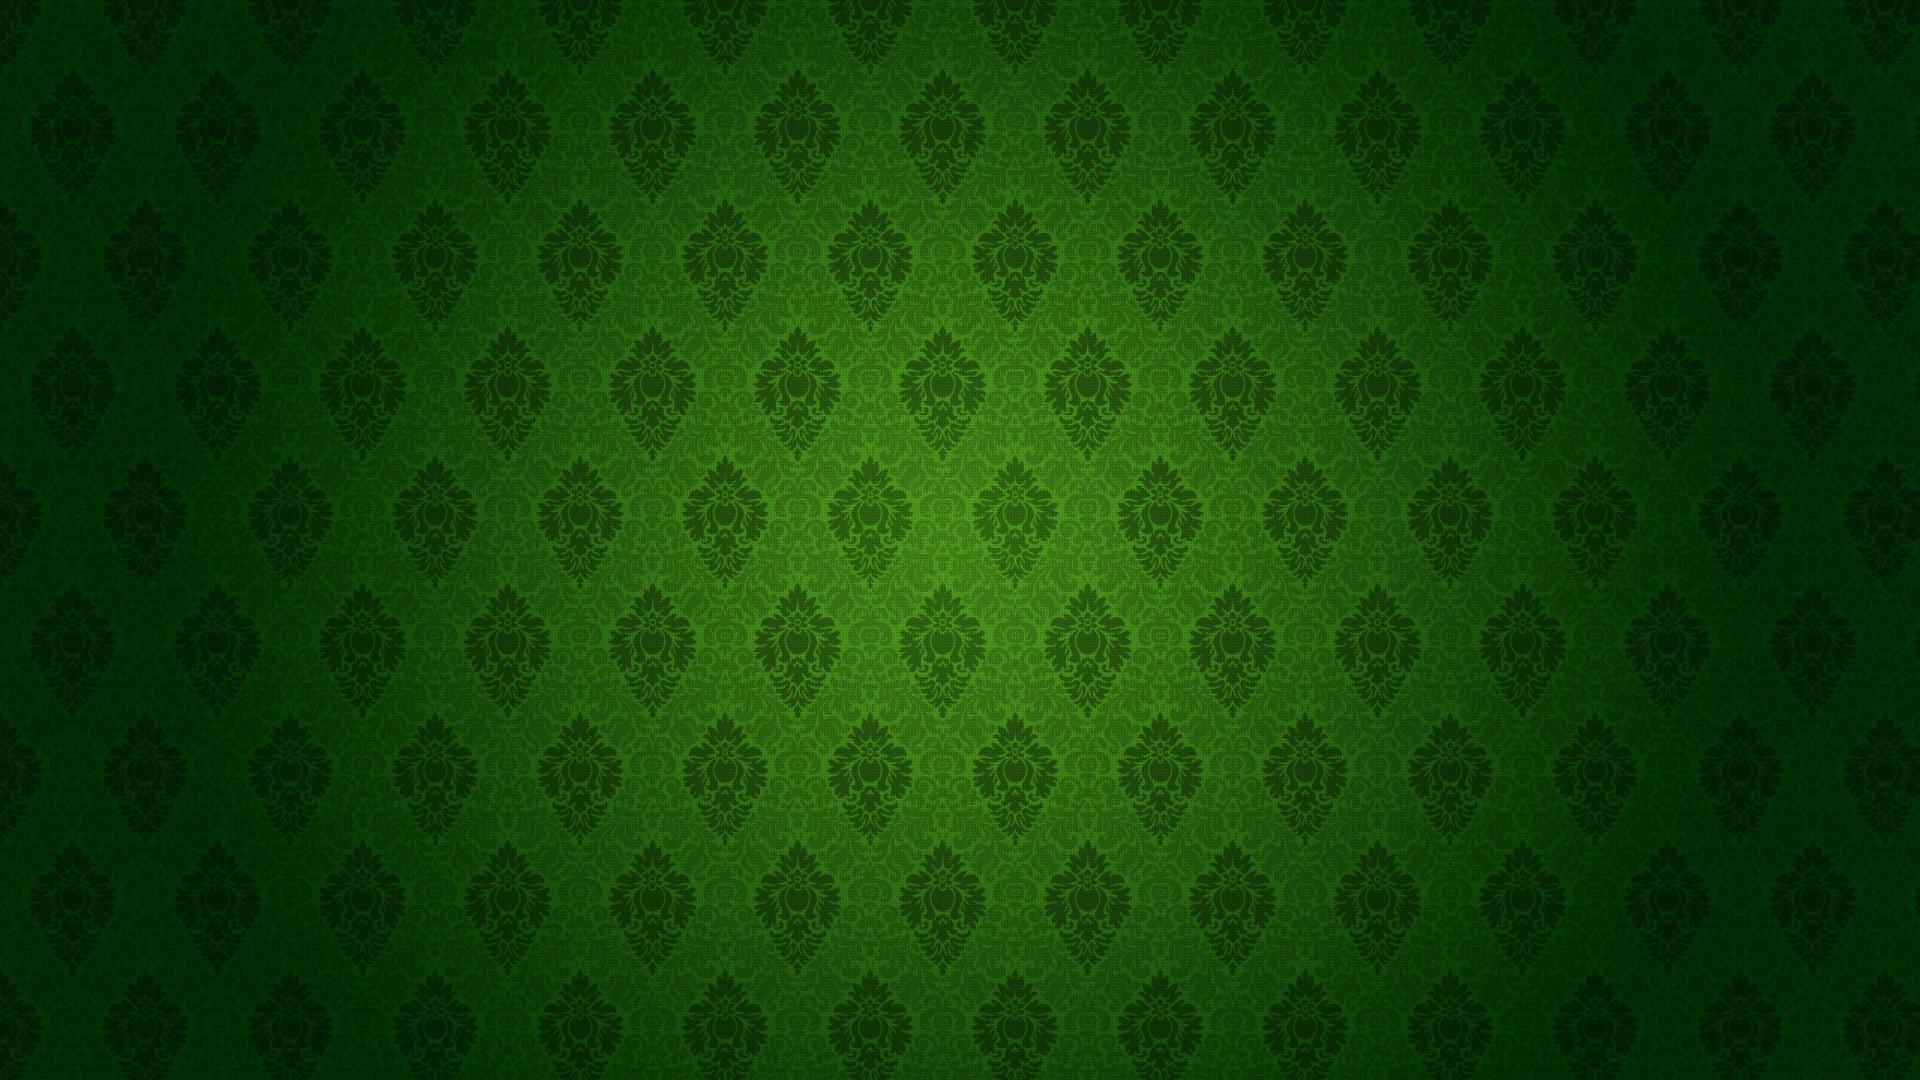 animated hd green image